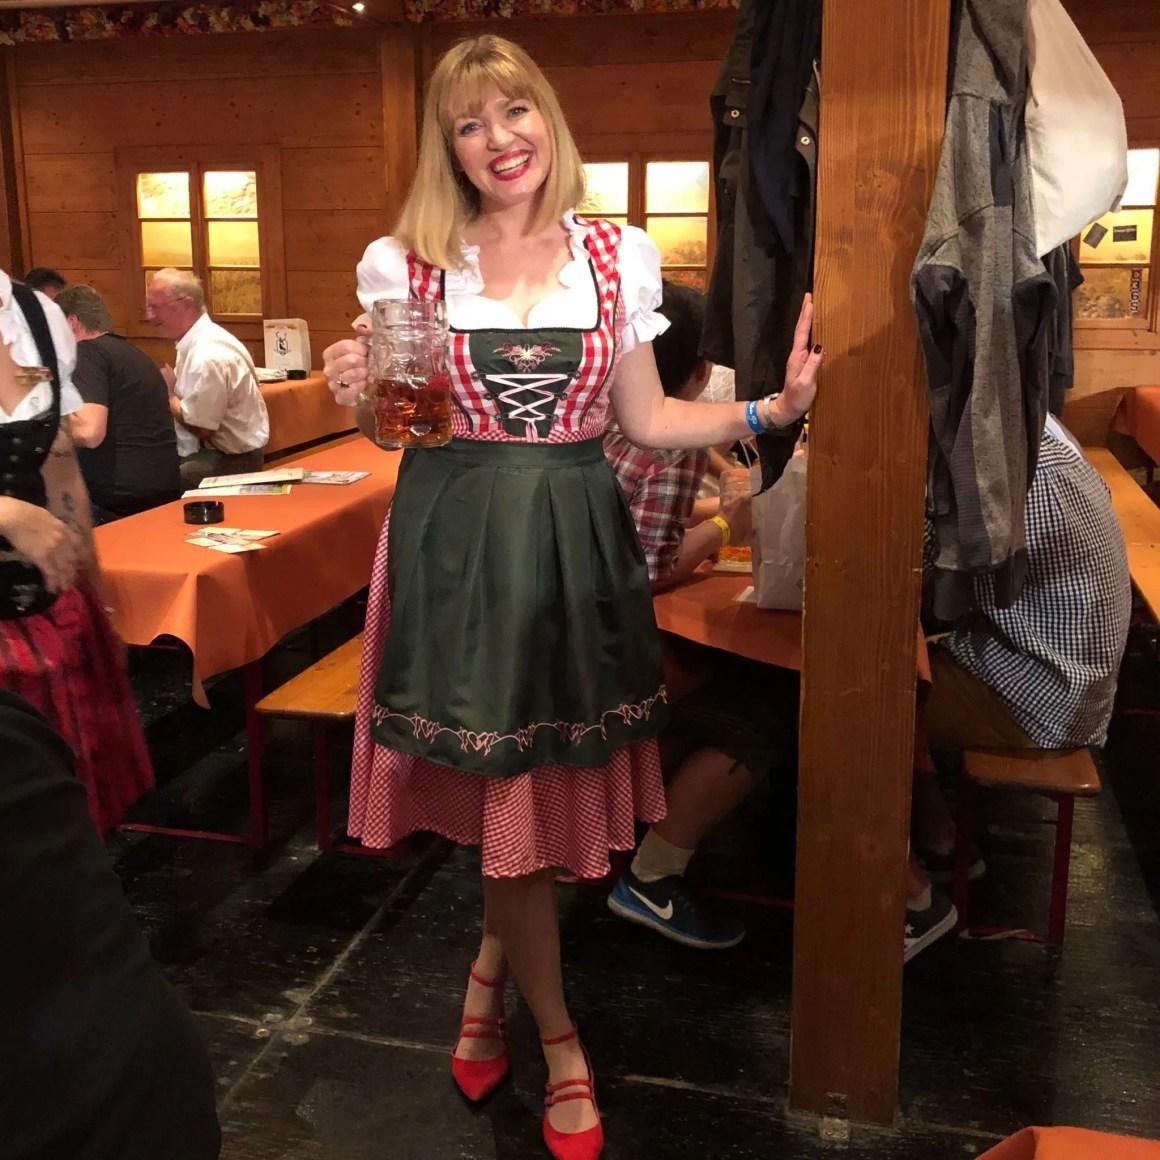 Stuttgart beer festival, Lizzy dirndl